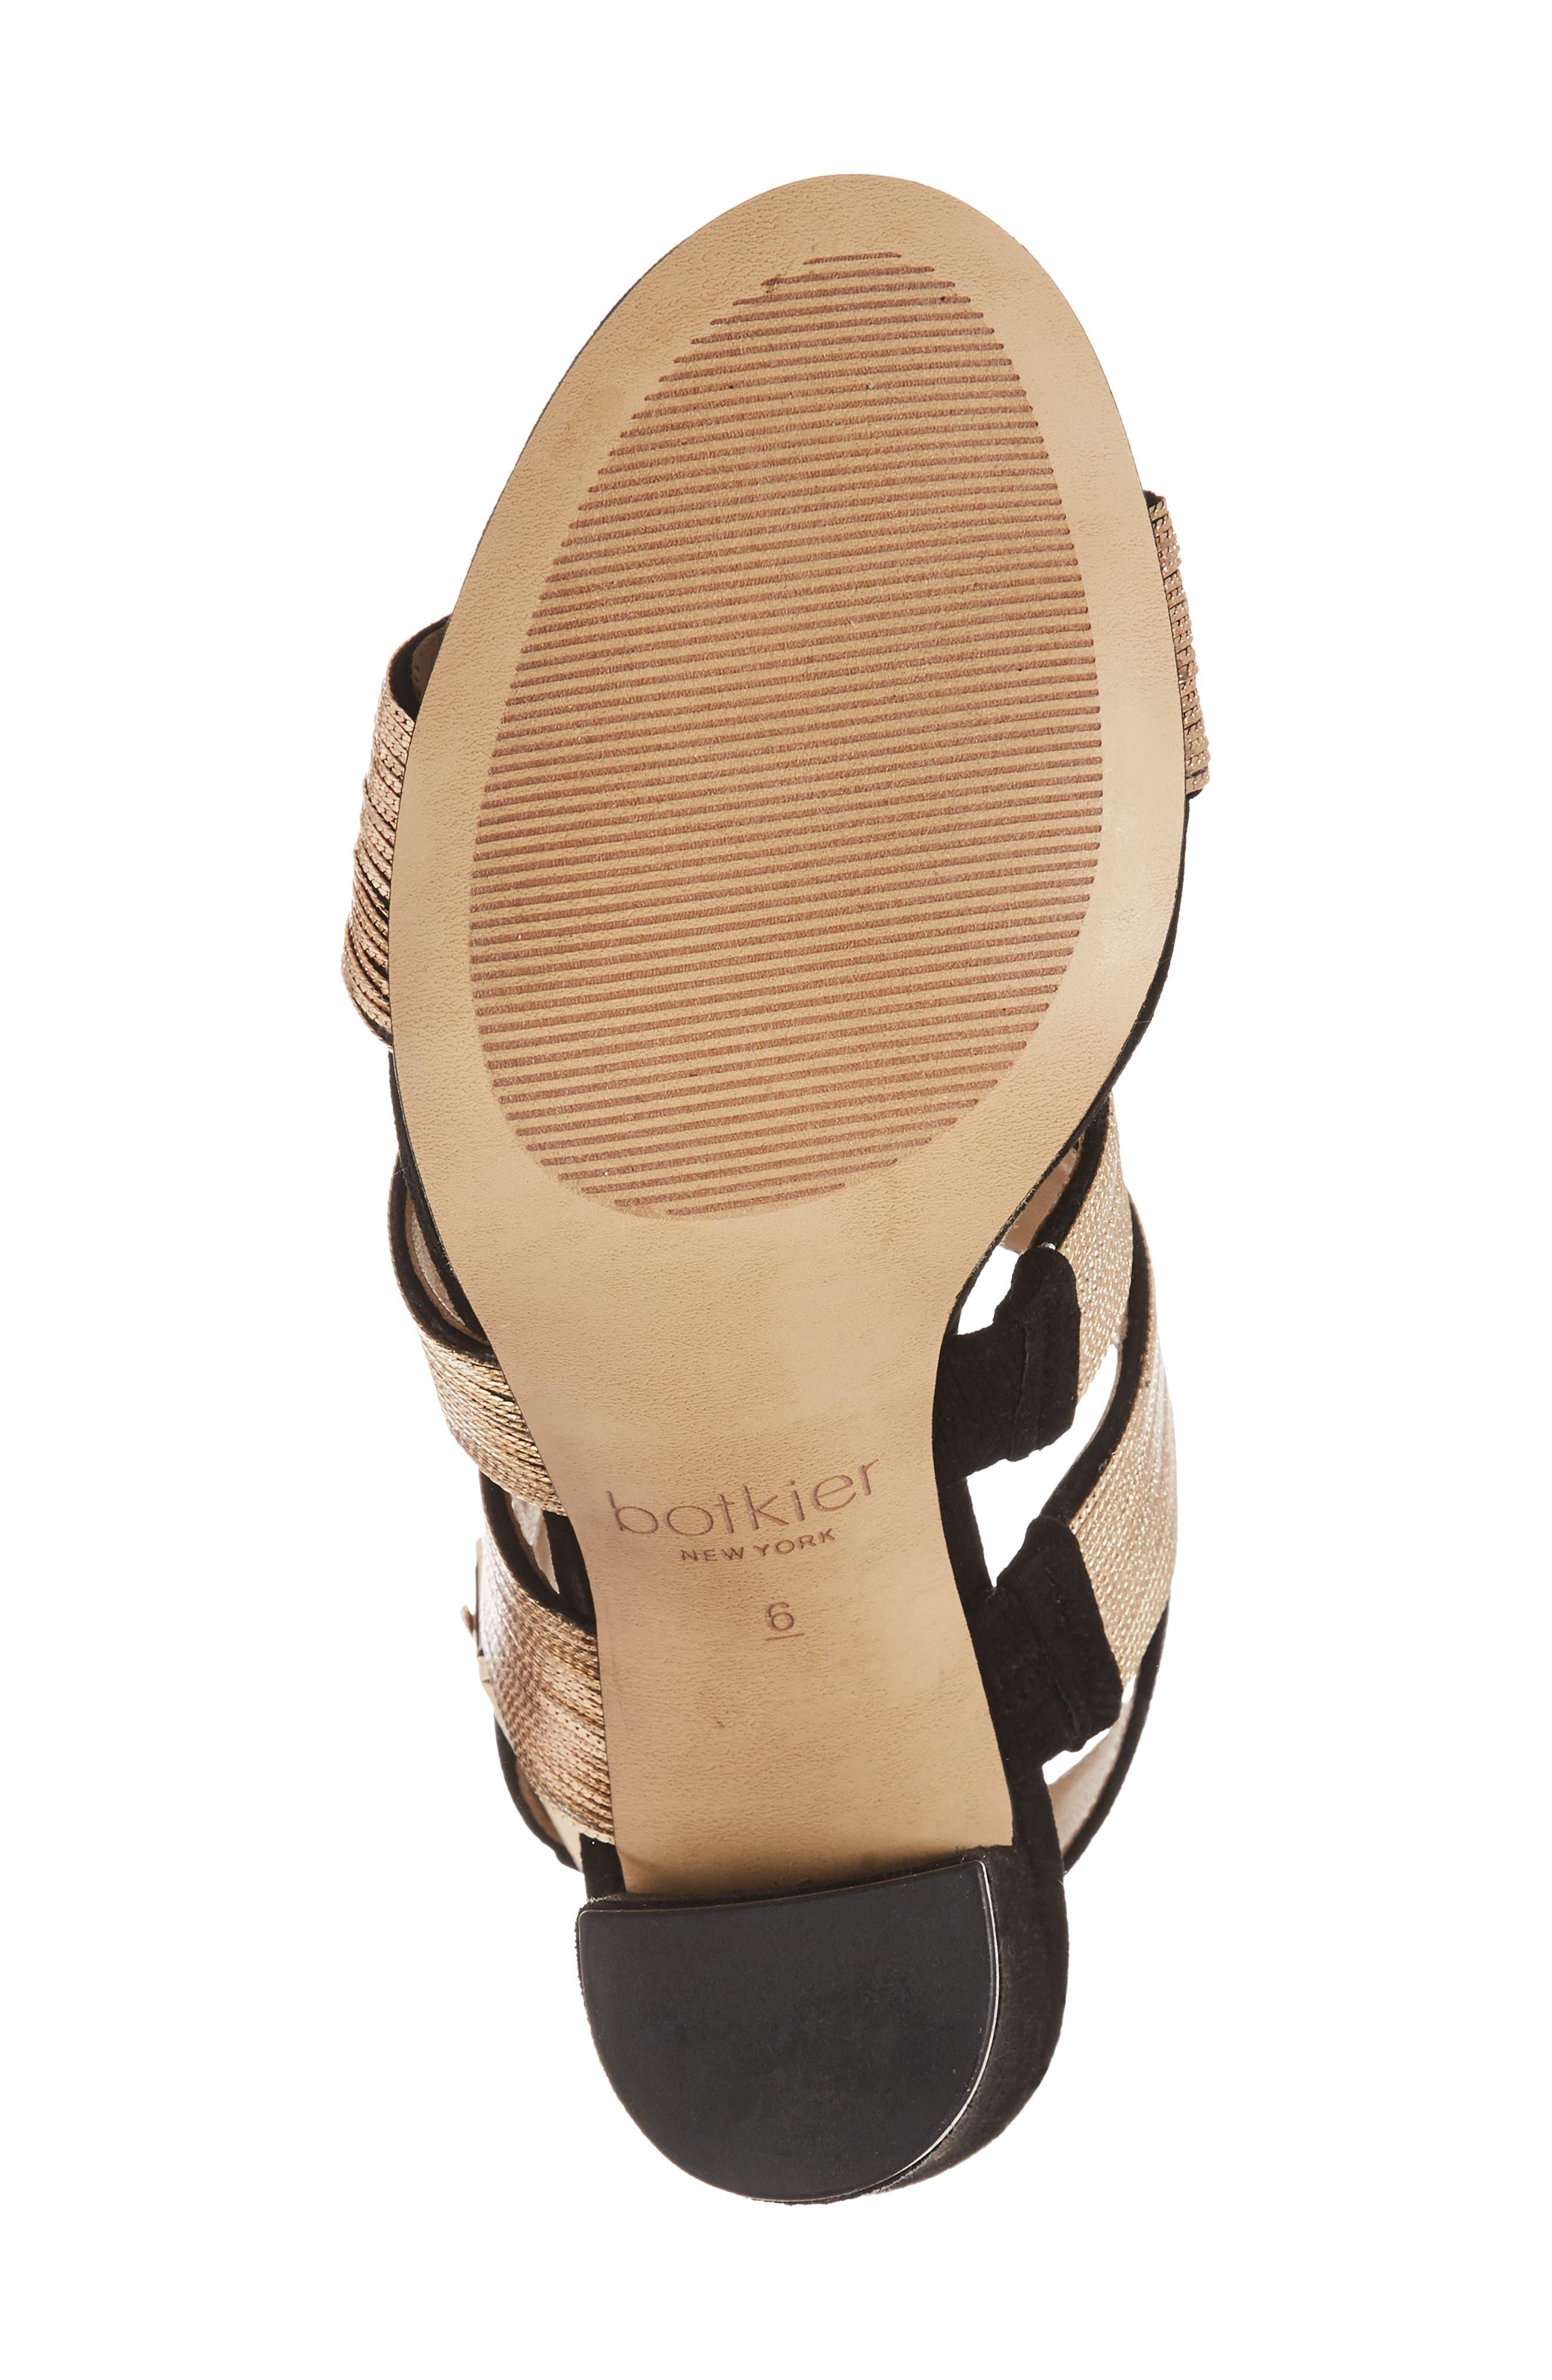 Genesa Chain Slingback Sandal,                             Alternate thumbnail 6, color,                             Black/ Gold Suede